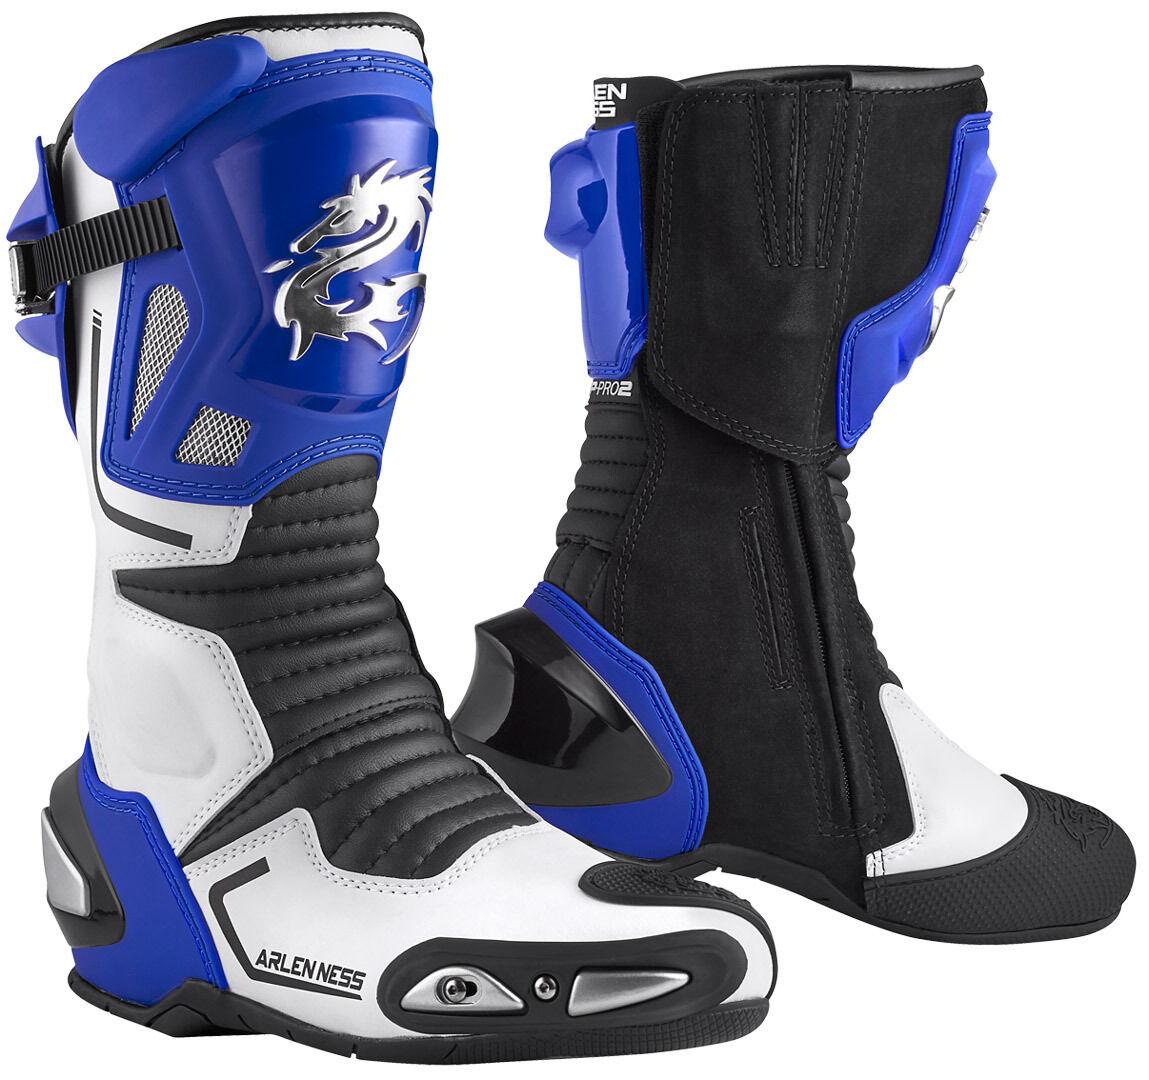 Arlen Ness Sugello Bottes de moto Noir Blanc Bleu taille : 40